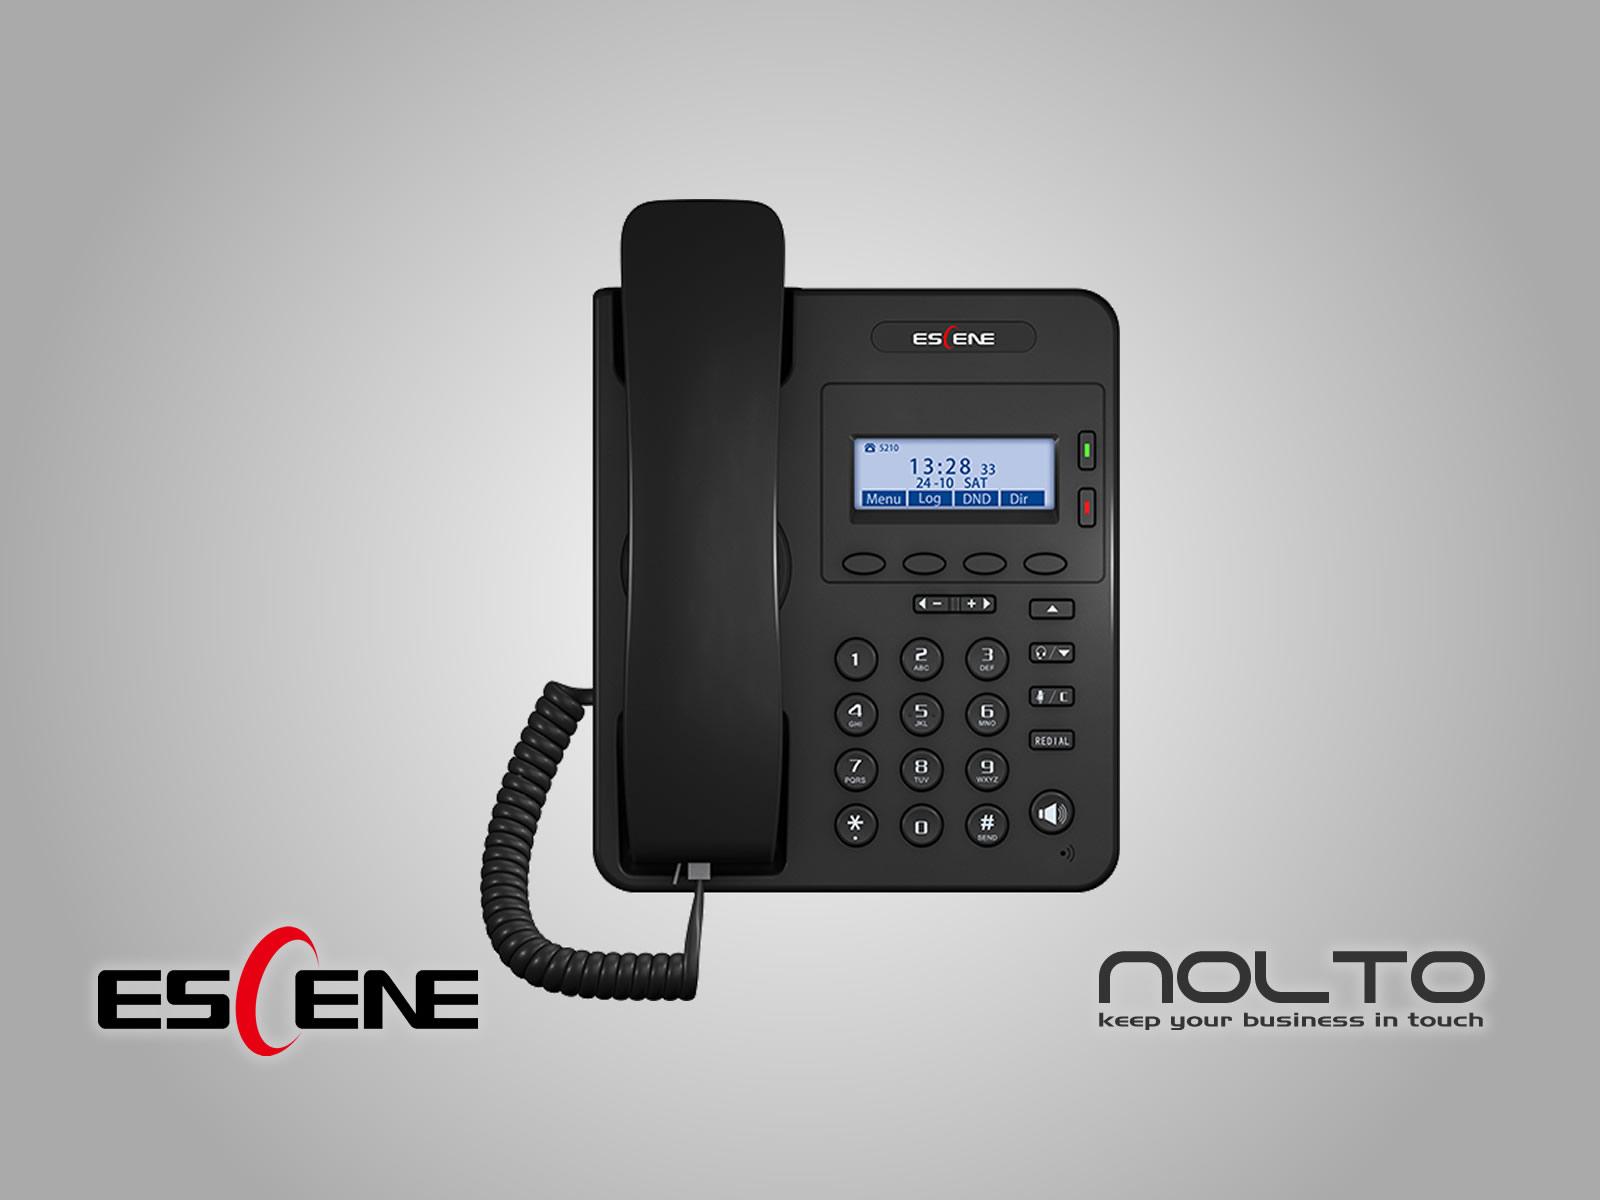 Escene ES210-P IP Telefon